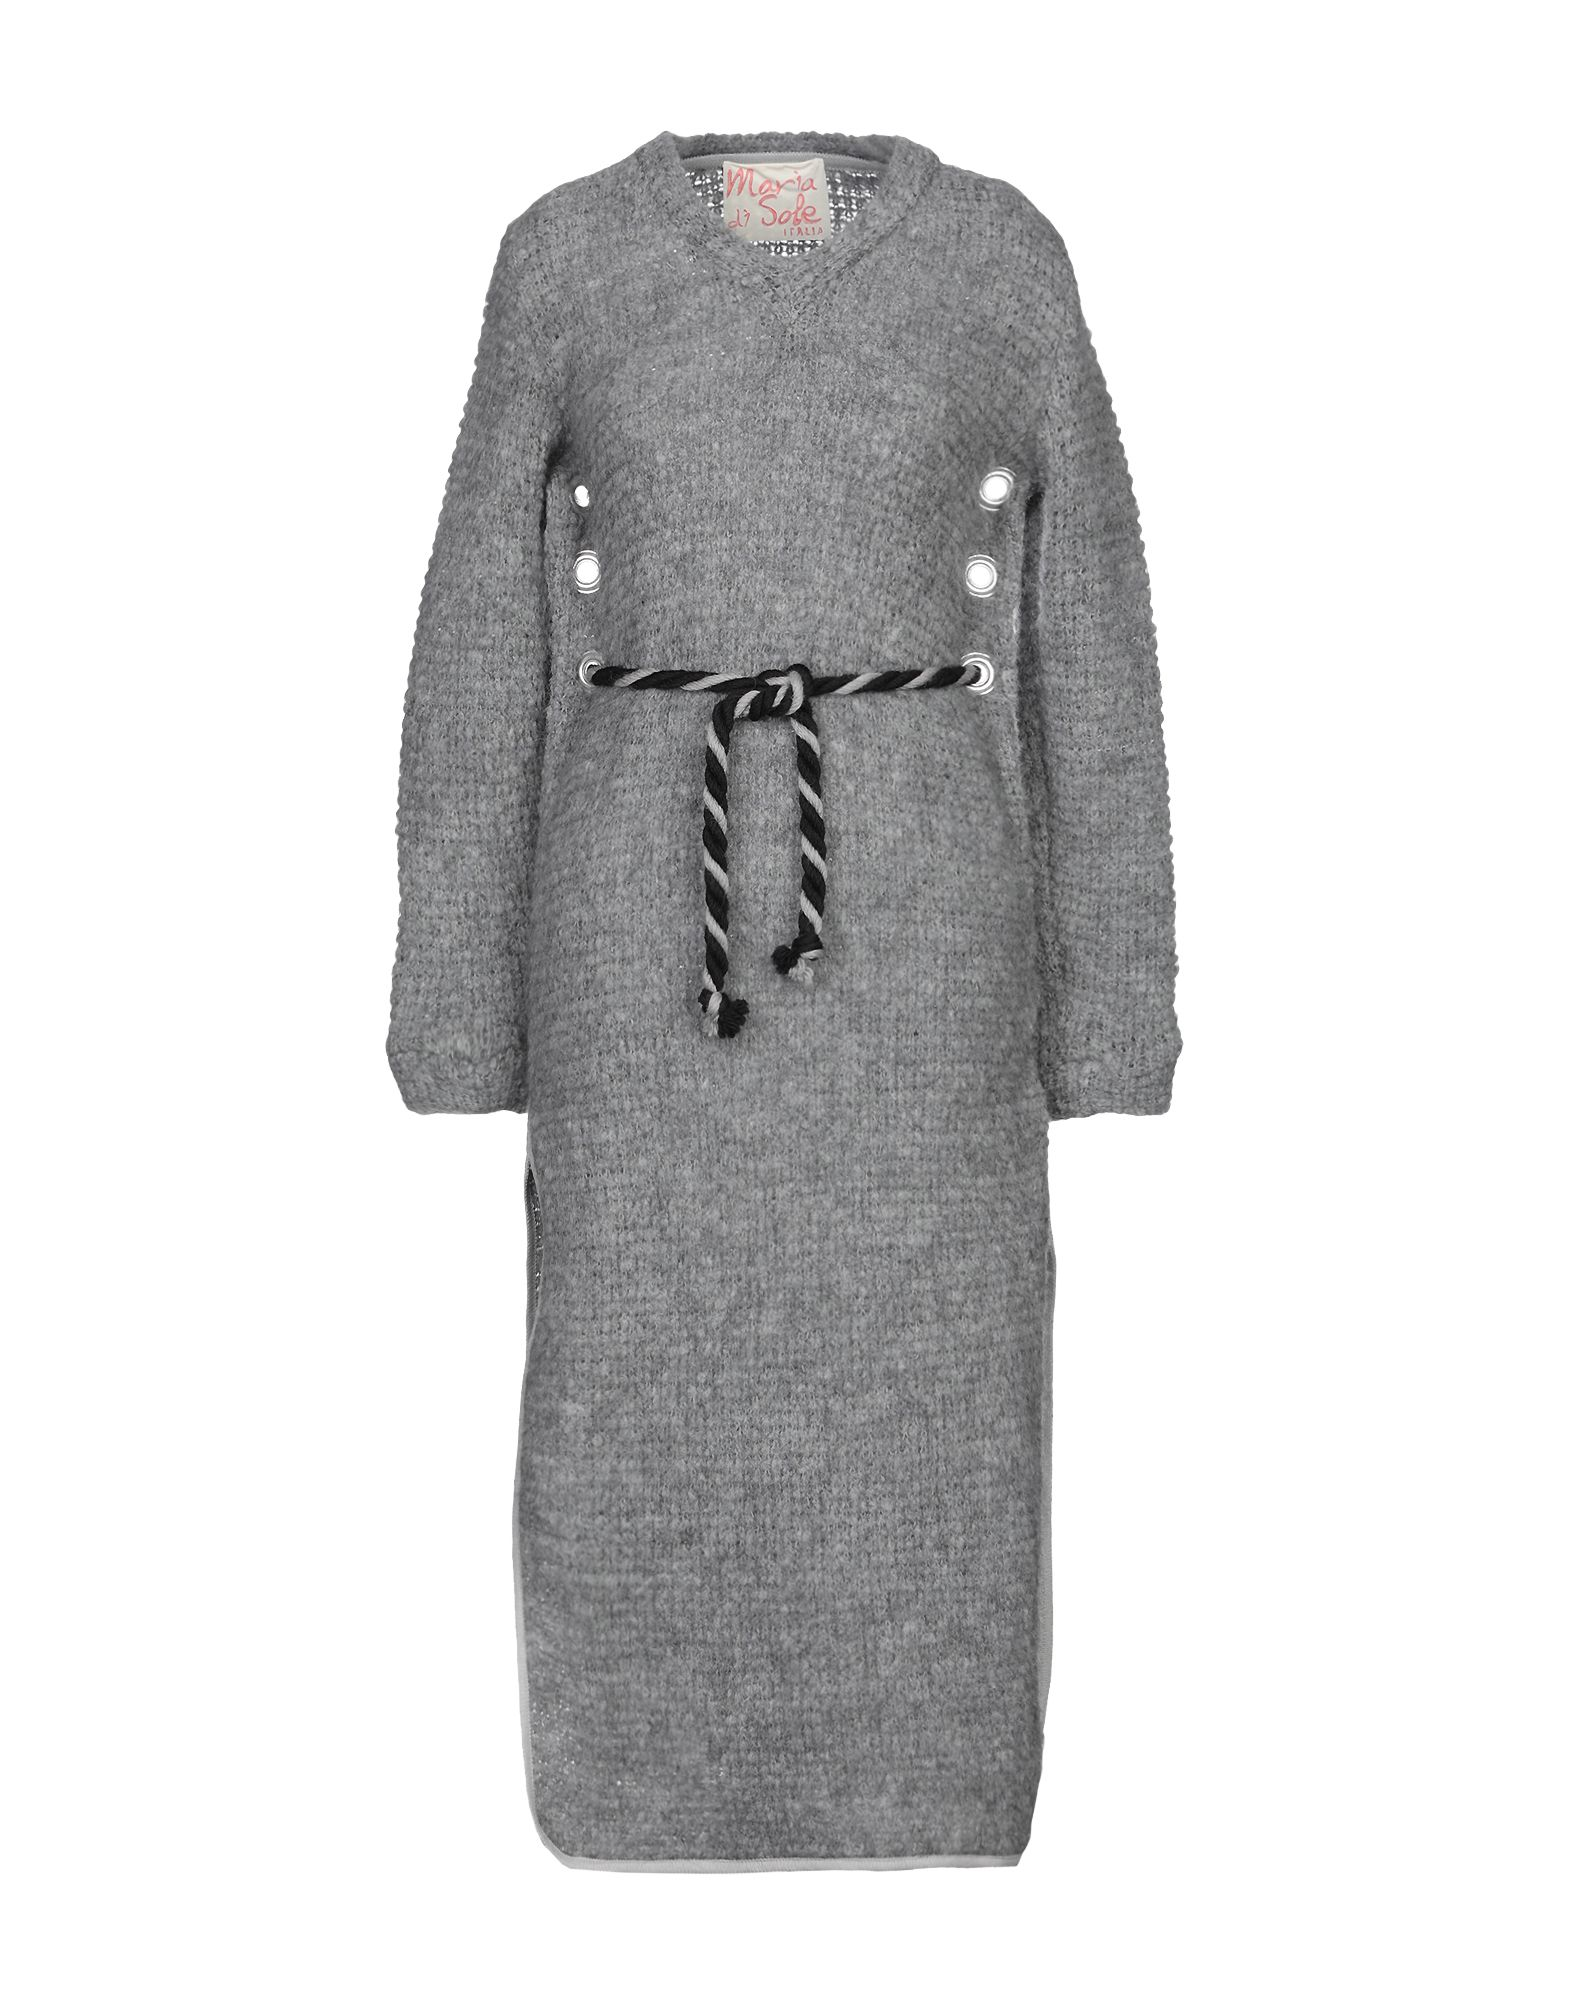 Фото - MARIA DI SOLE Платье длиной 3/4 maria grachvogel платье длиной 3 4